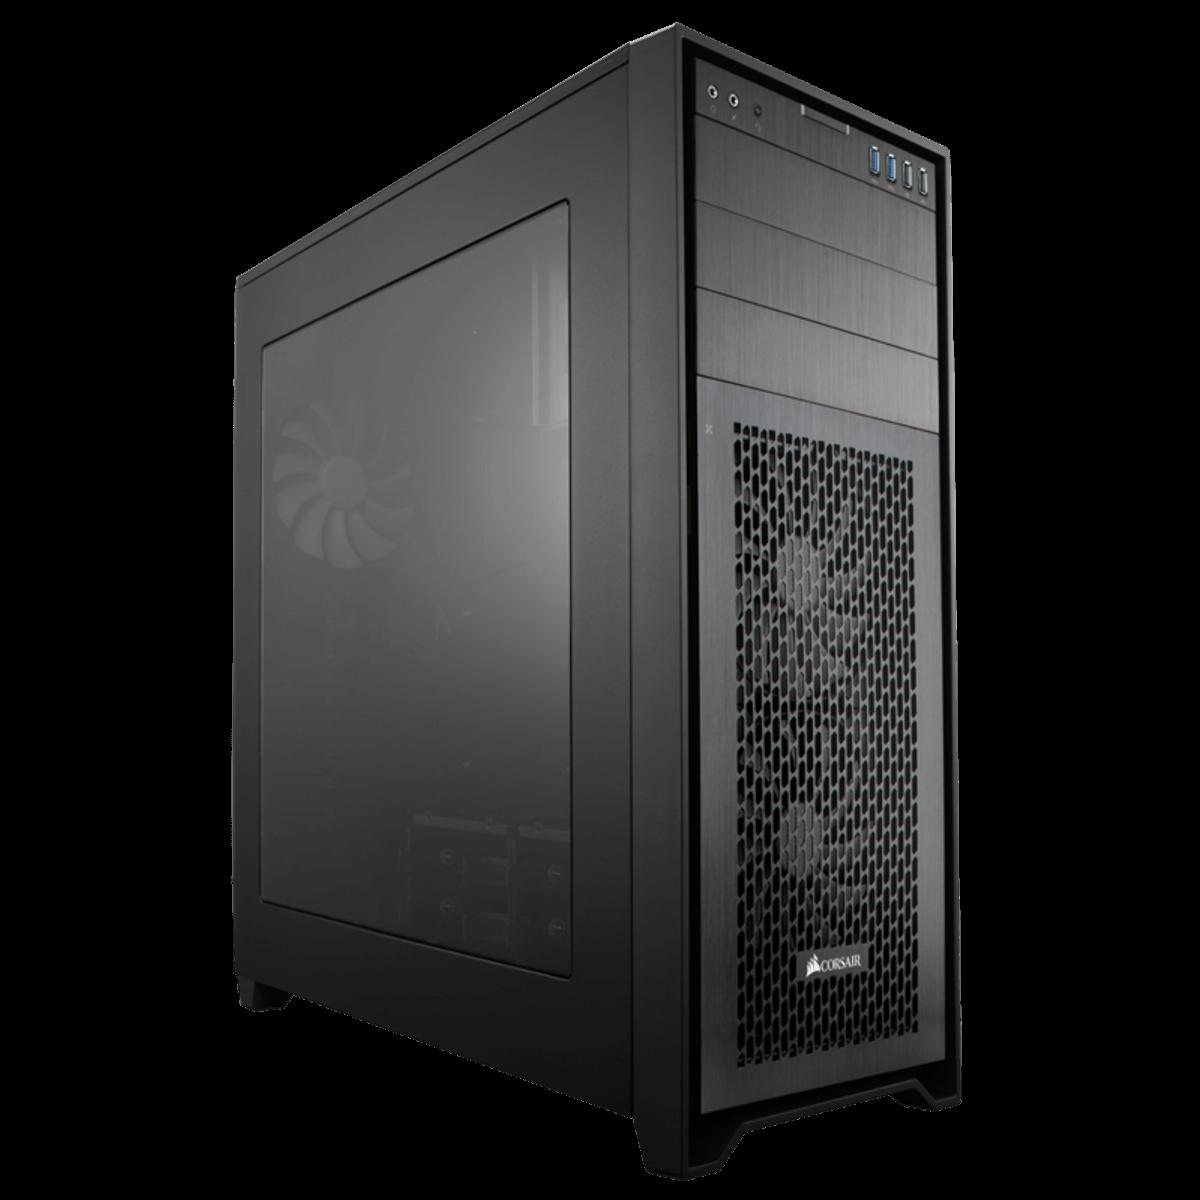 Gabinete Gamer Corsair Obsidian 750D Airflow Edition, Full Tower, Com 3 Fans, Black, Sem Fonte, CC-9011078-WW